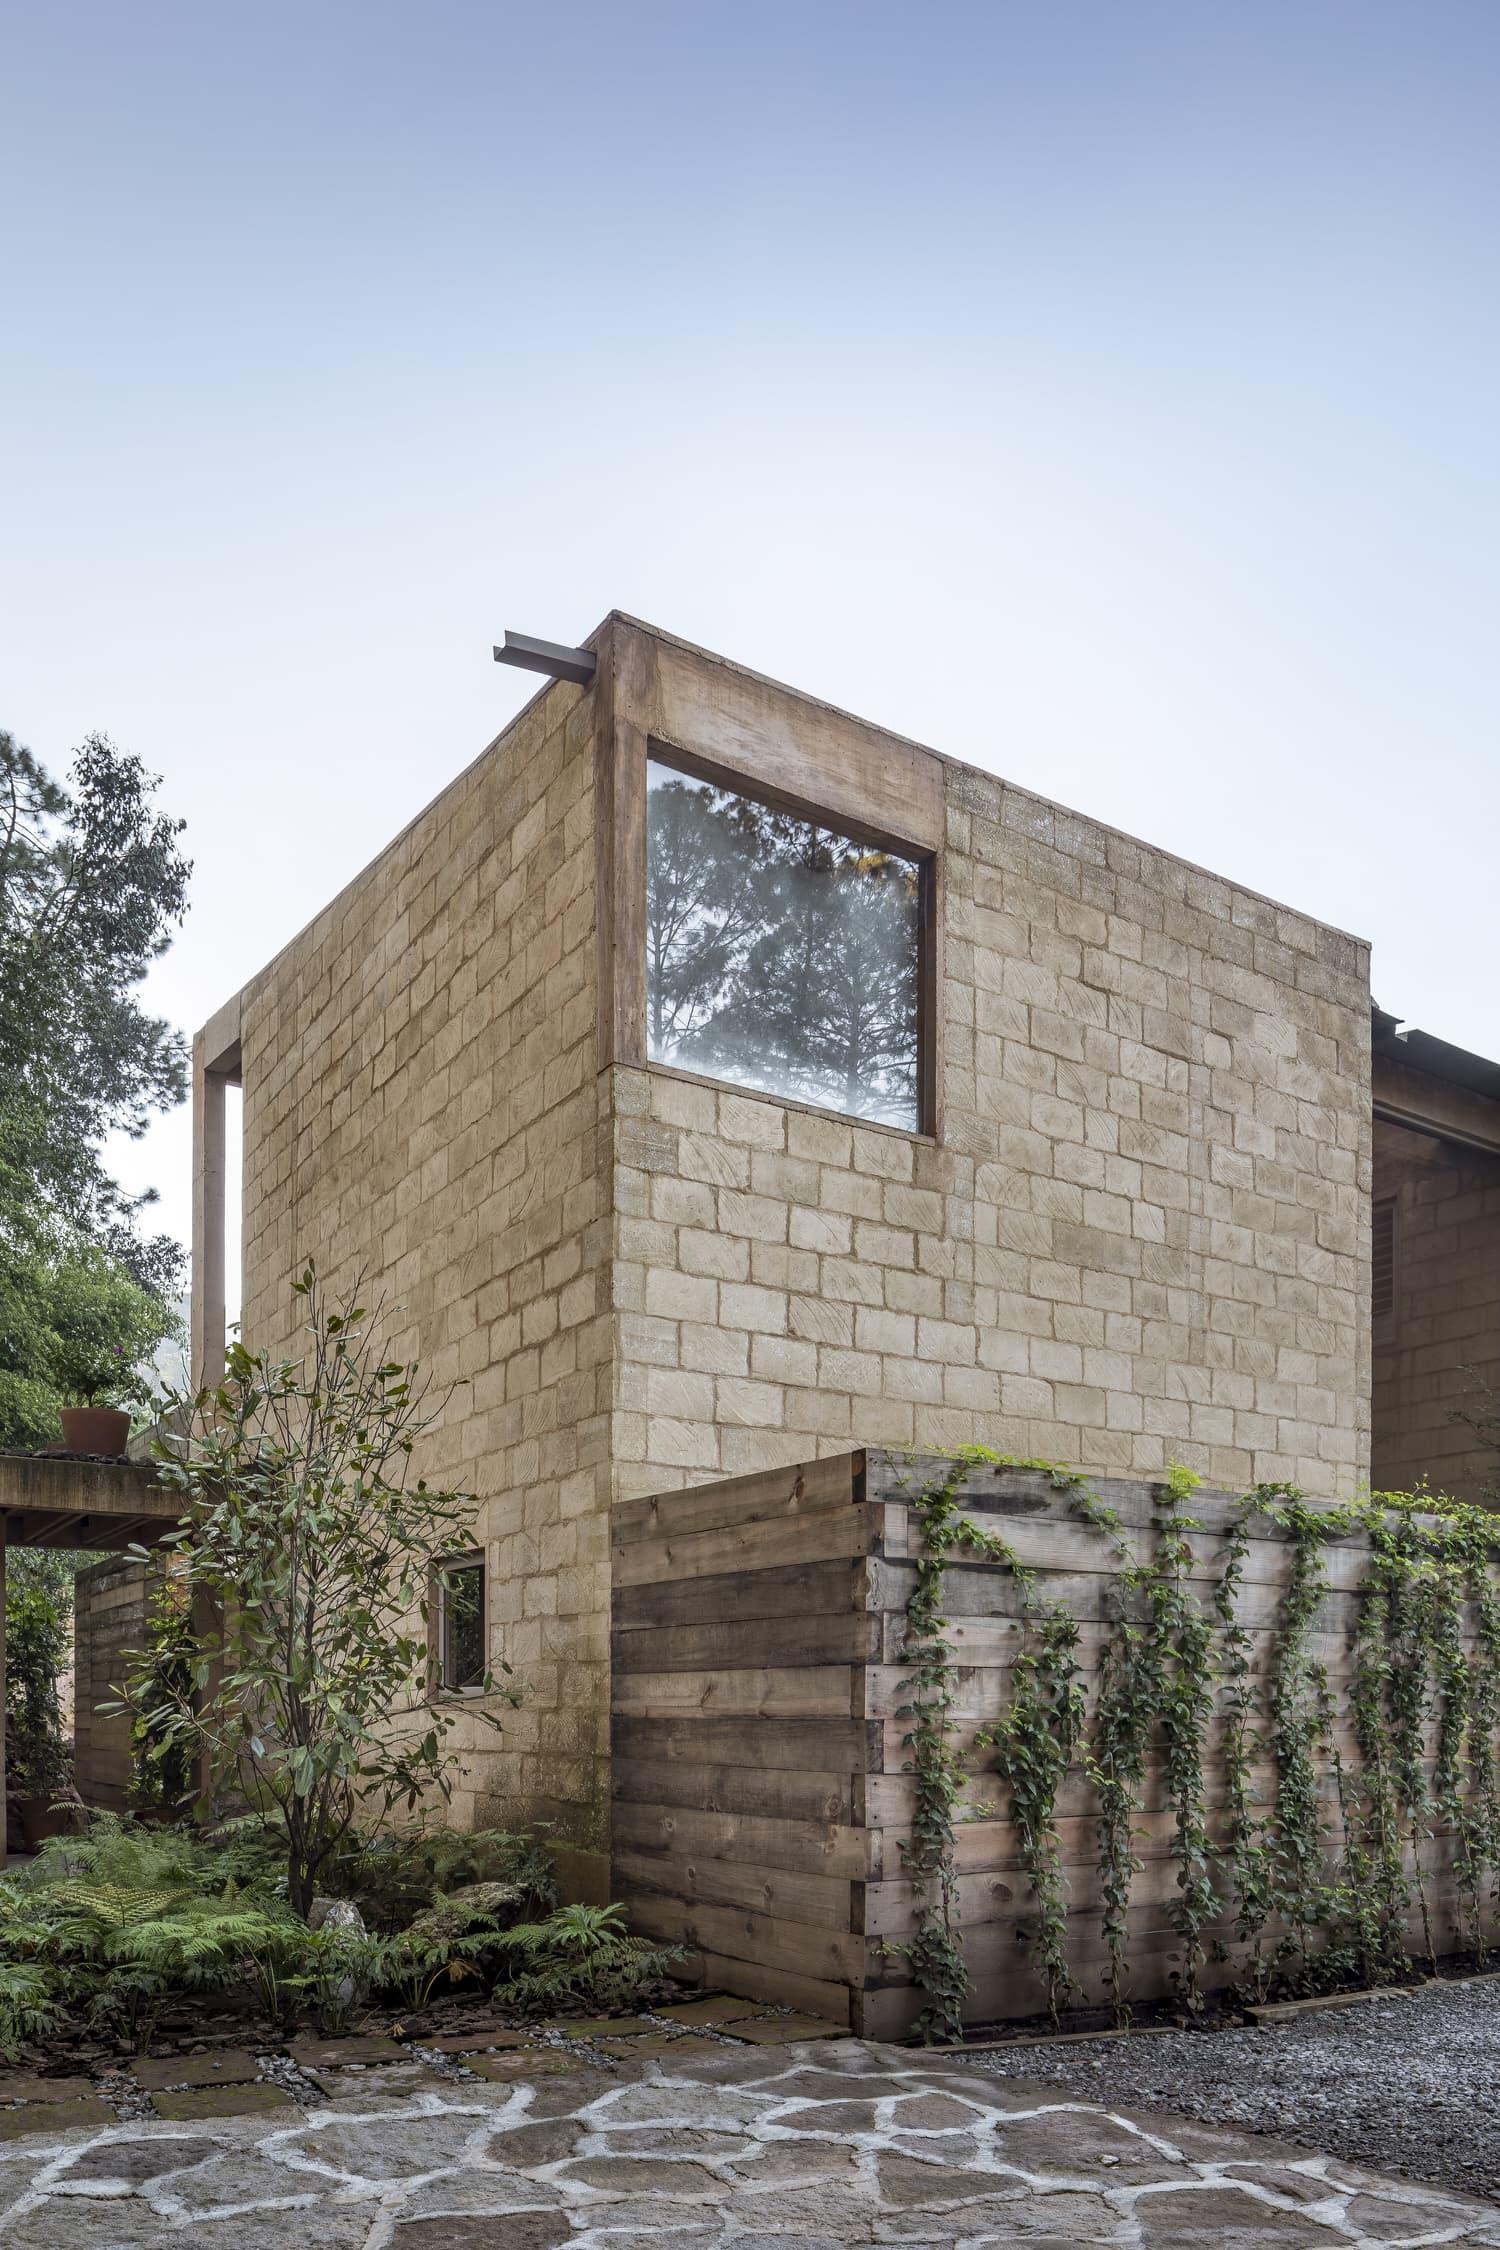 House in Avandaro, Mexico by Taller Hector Barroso.